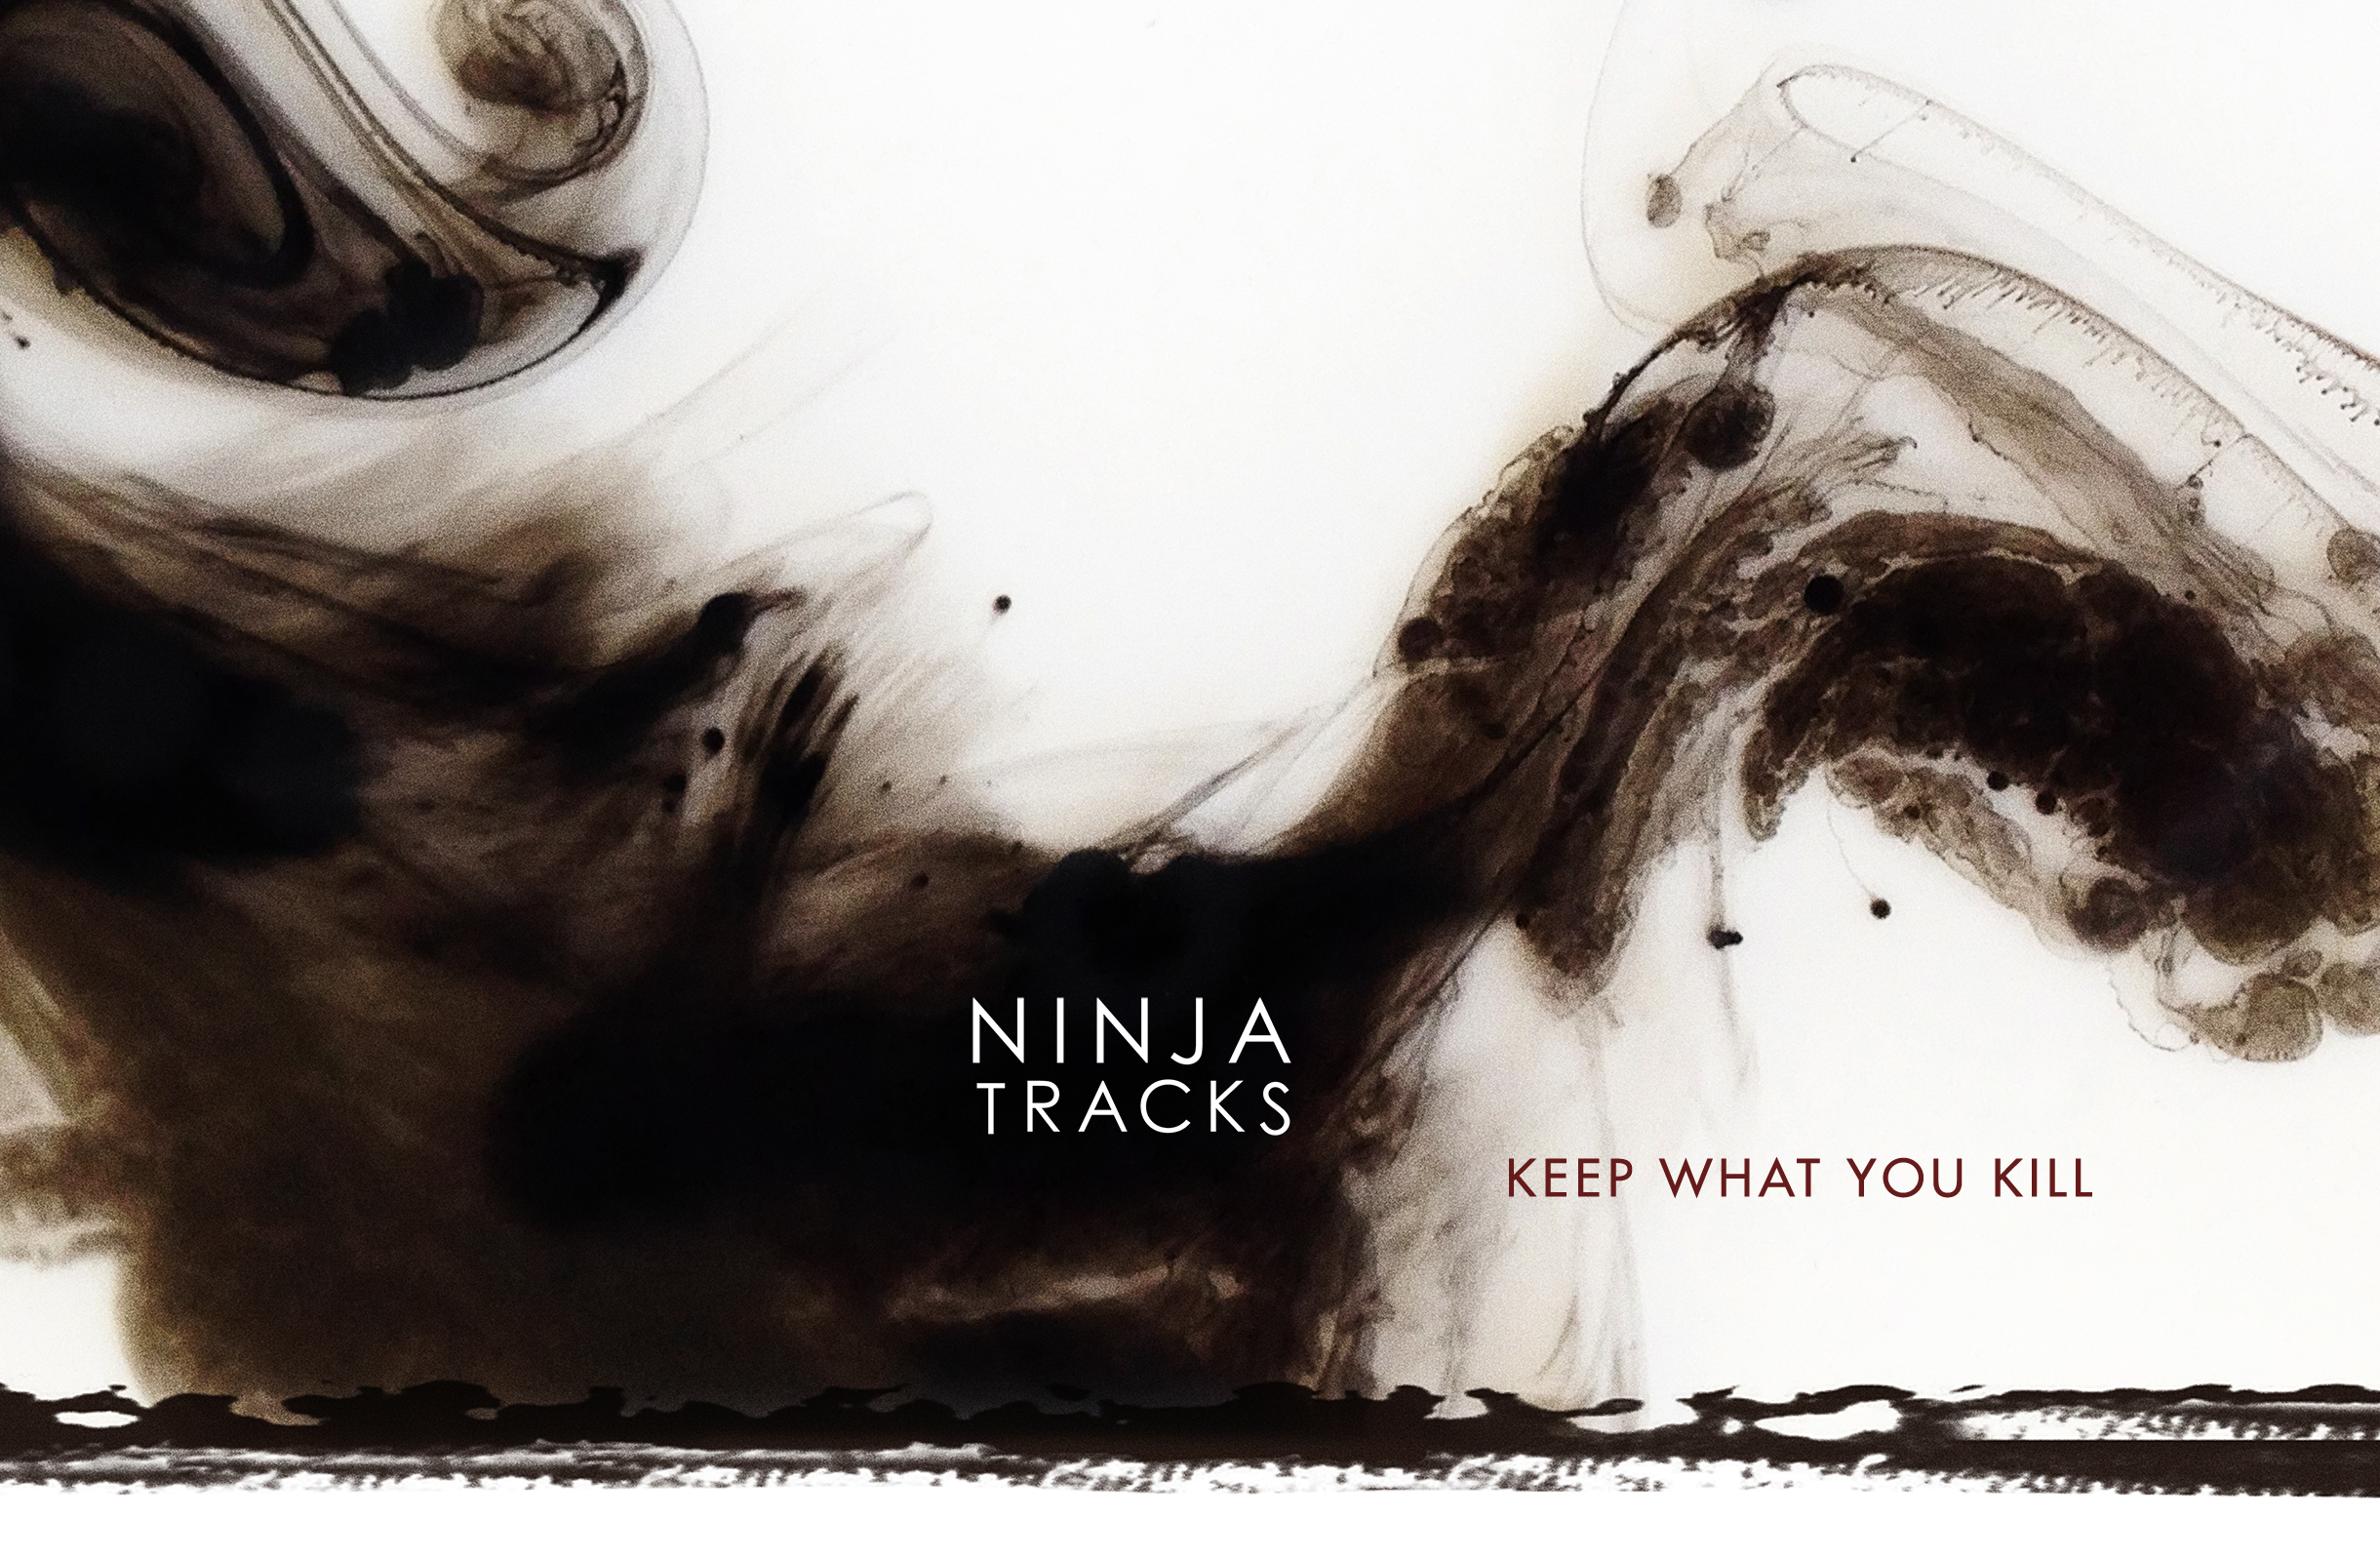 NINJA-KEEP WHAT YOU KILL-2440x1600.jpg